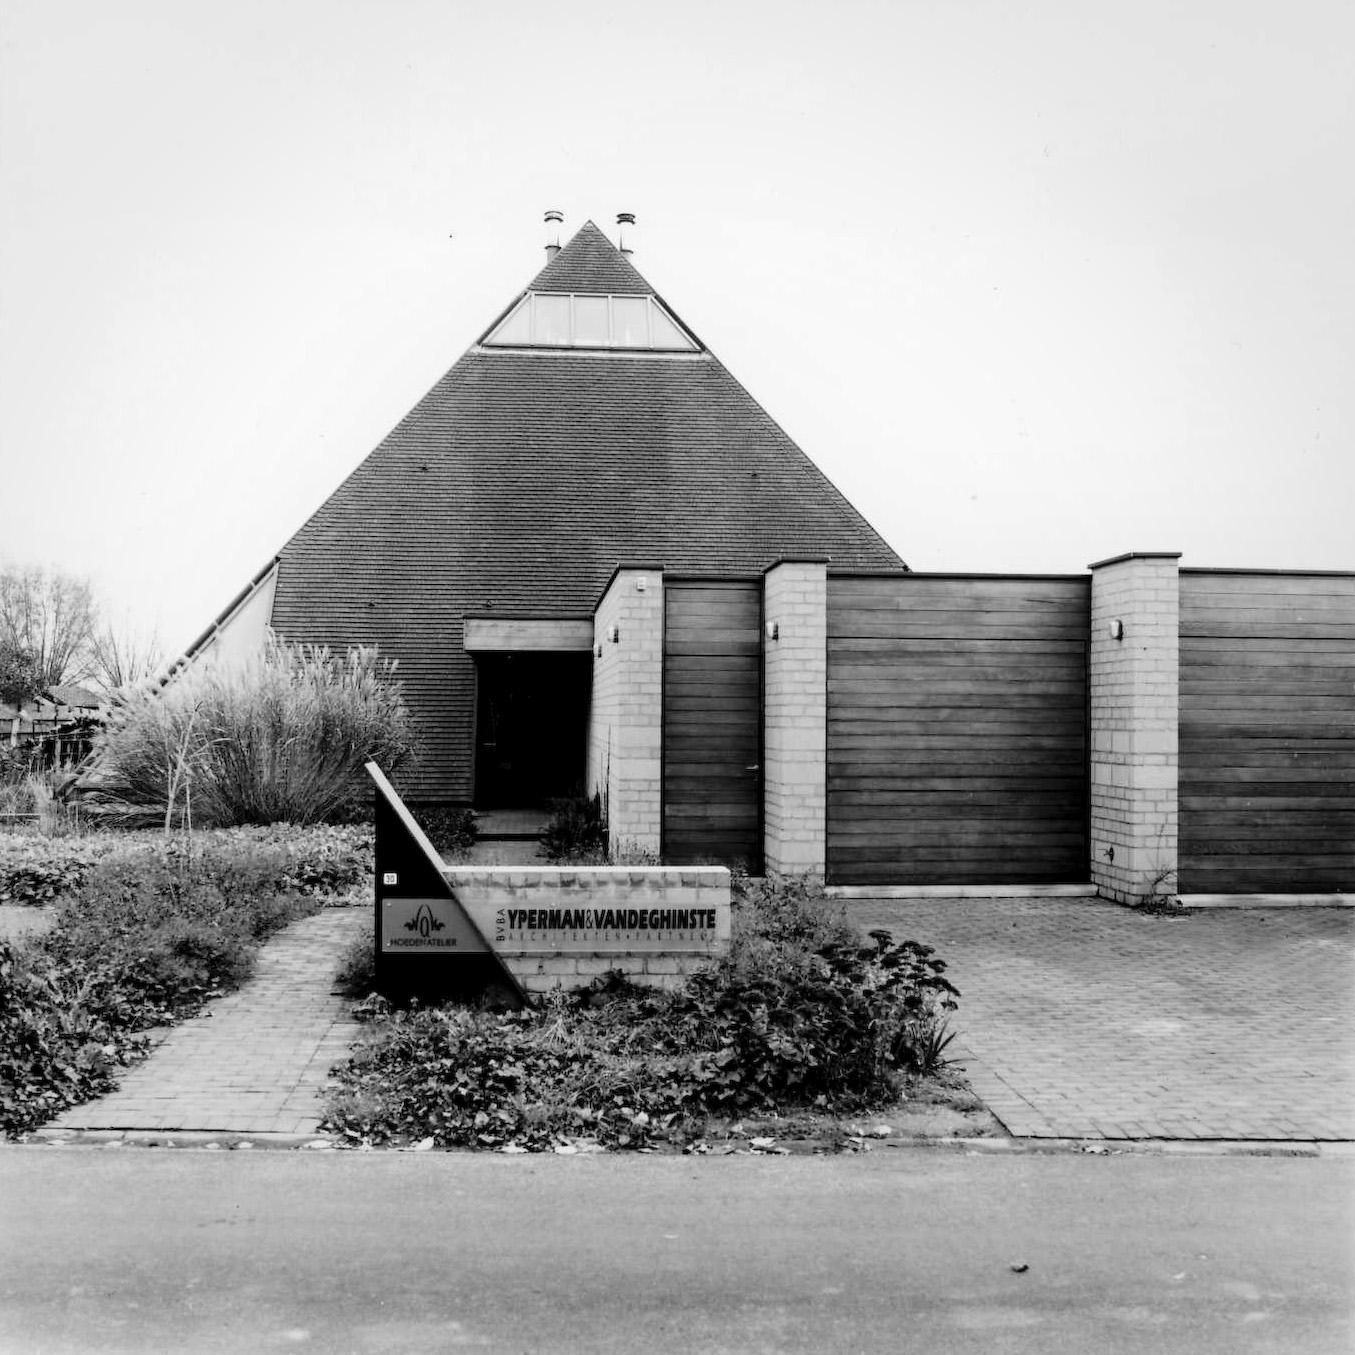 Foto's: UNITAS 1996, Walter Desnoeck